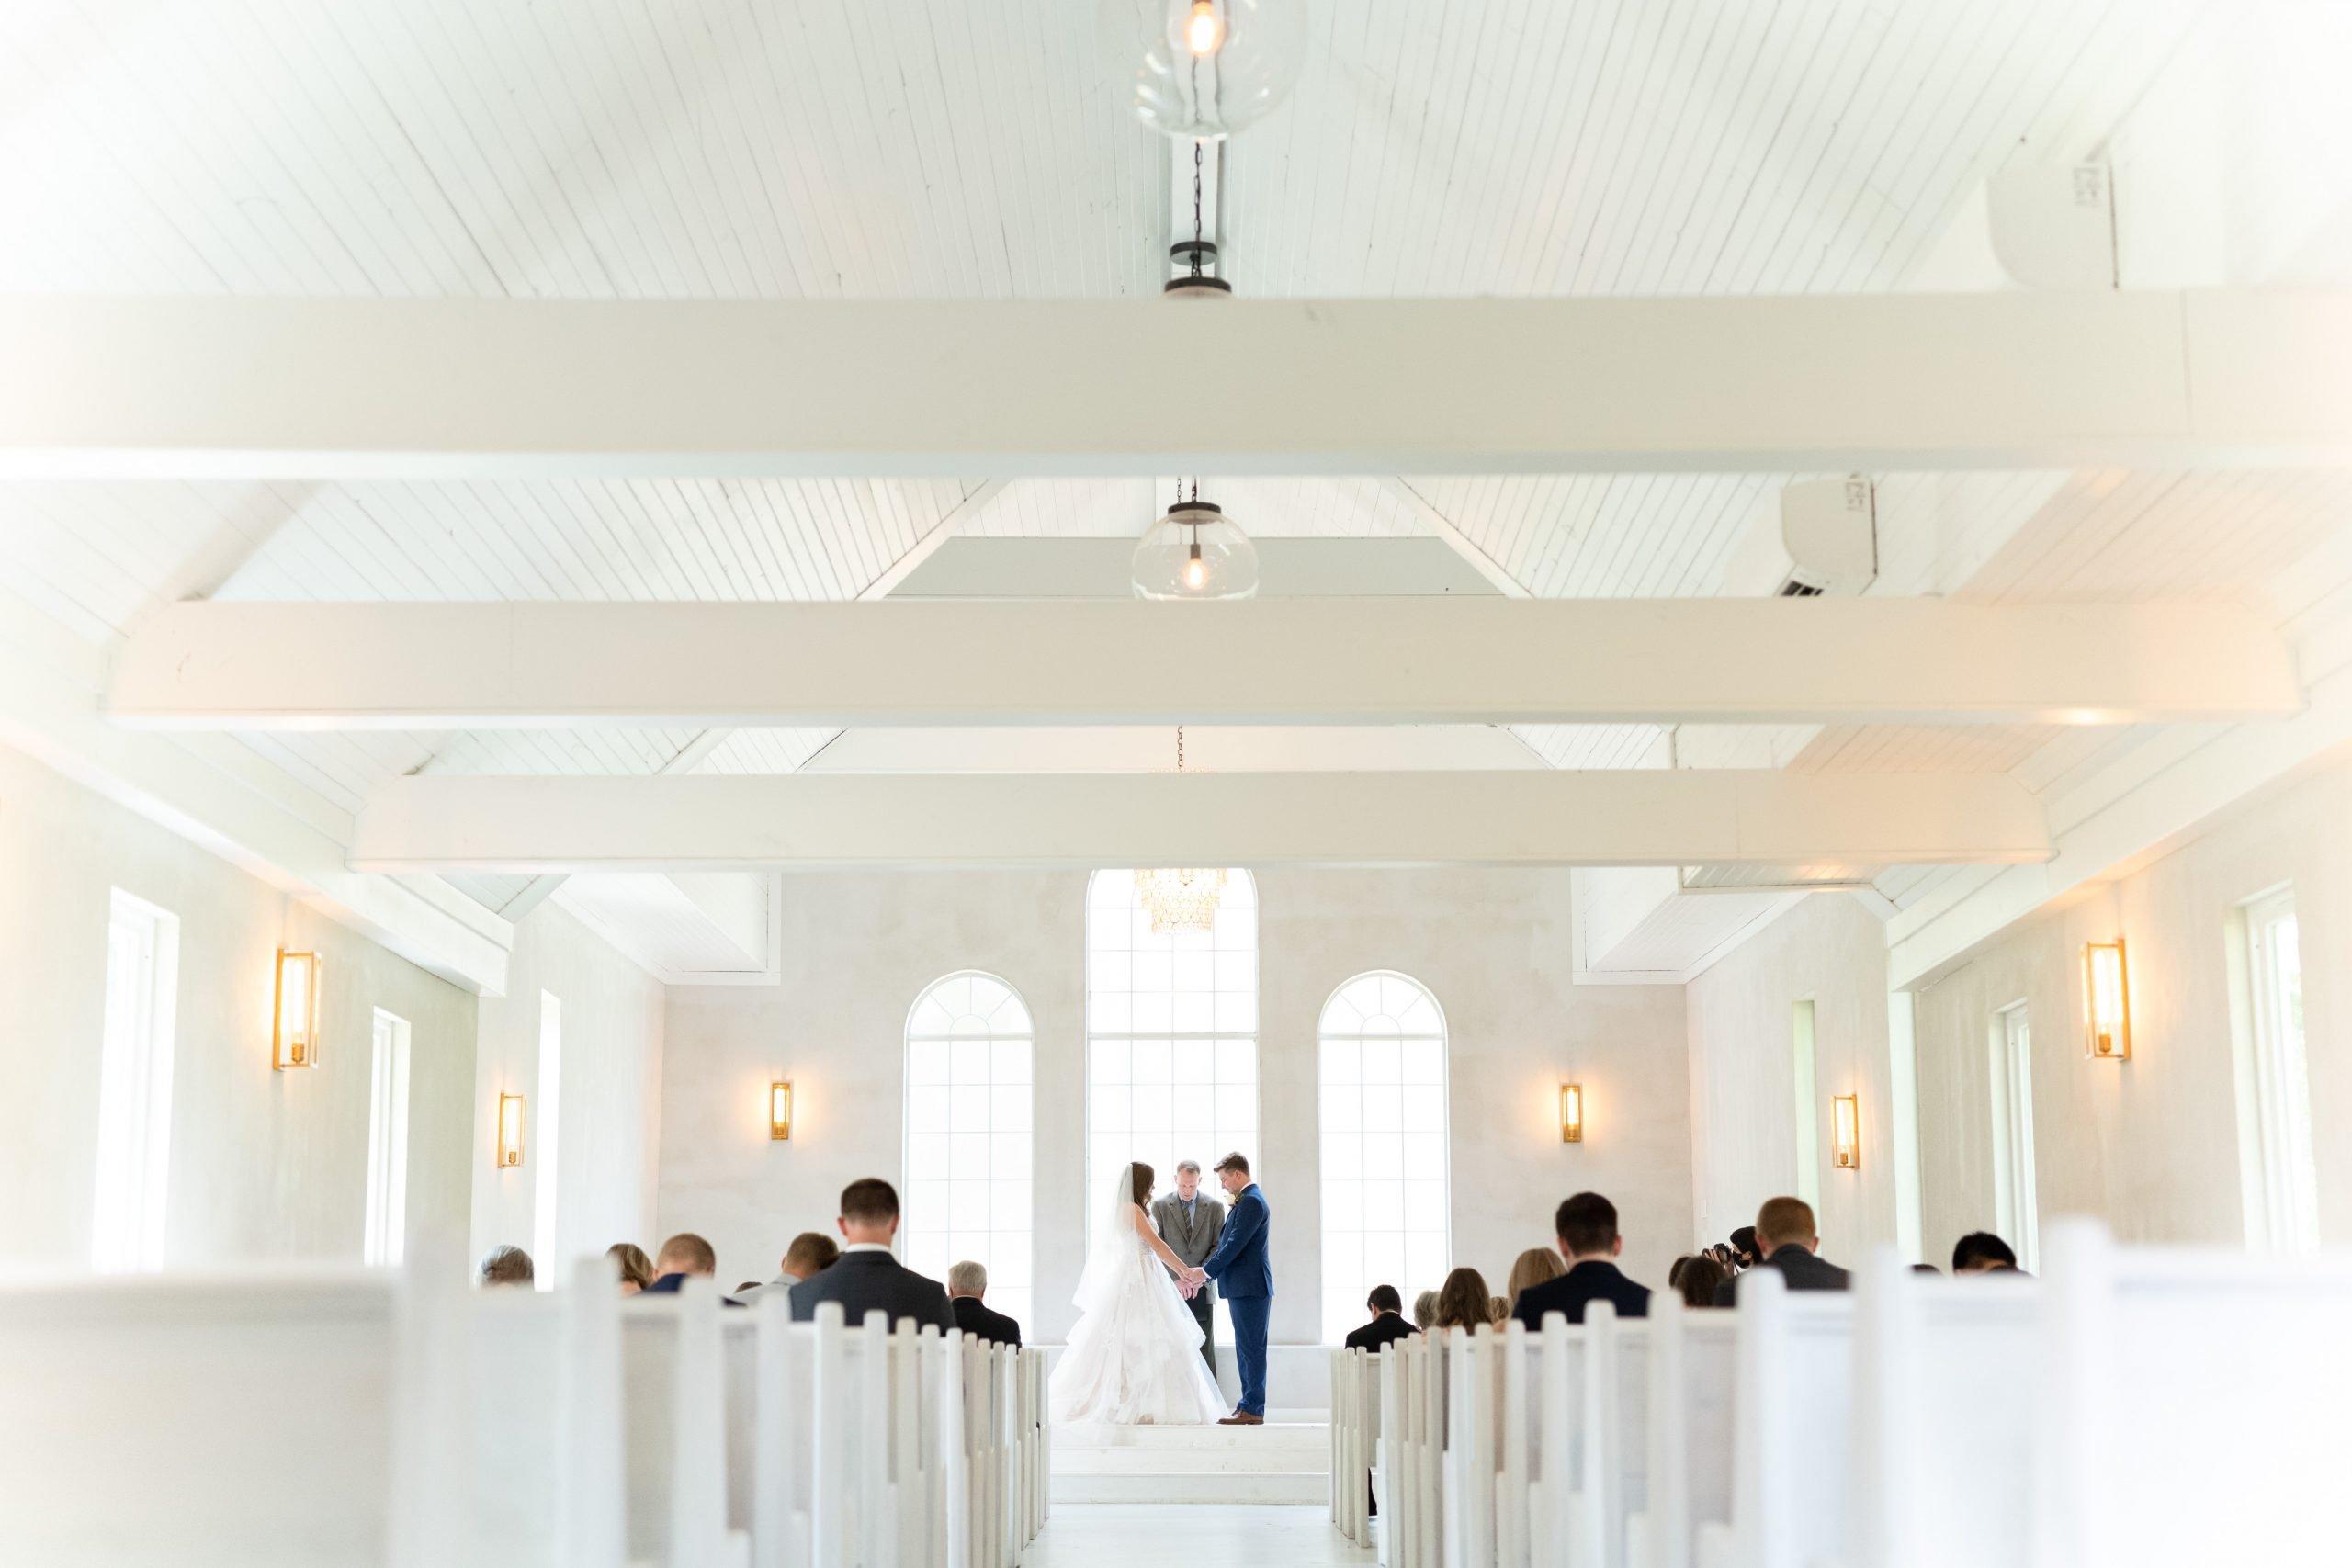 Ben Q Photography - Bride & Groom - Dallas Wedding - The Emerson - Formal Wedding Photo - Modern Wedding - Wedding Ceremony - Dallas, Texas